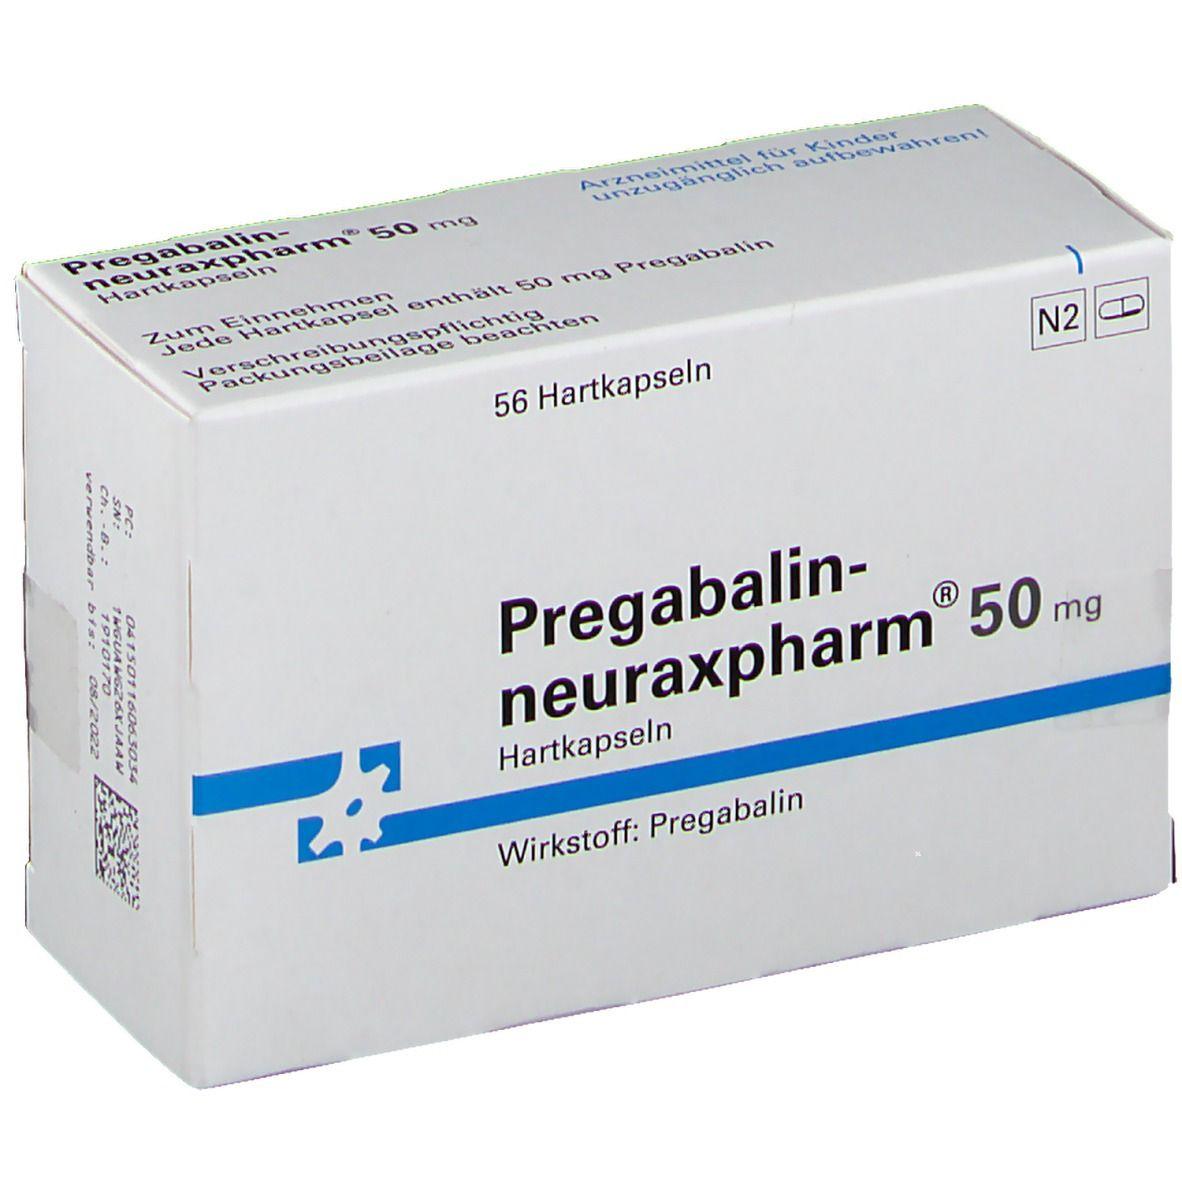 PREGABALIN-neuraxpharm 50 mg Hartkapseln